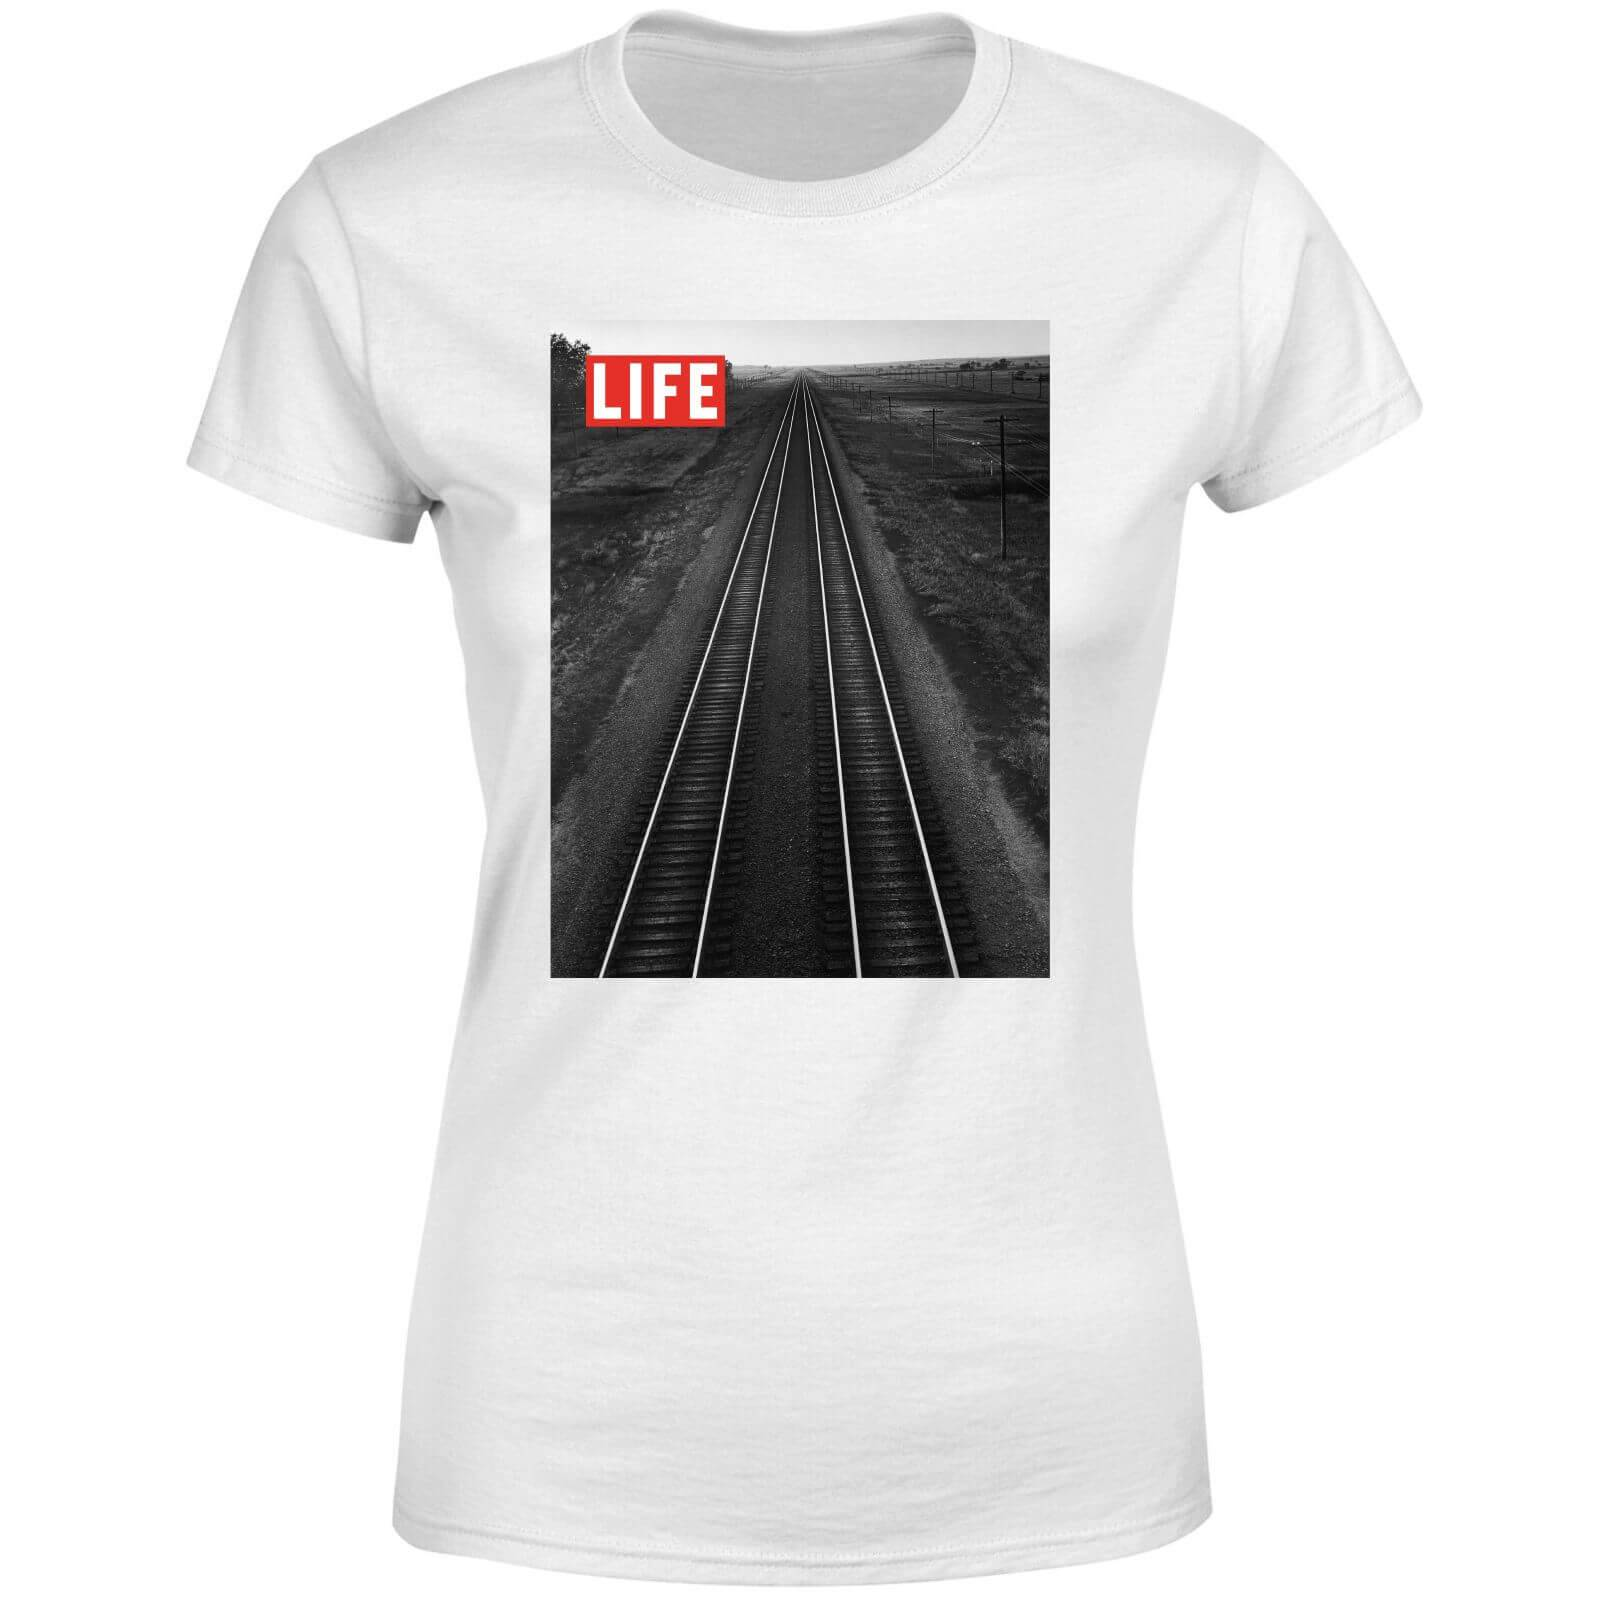 LIFE Magazine Railway Women's T-Shirt - White - XL - White-female